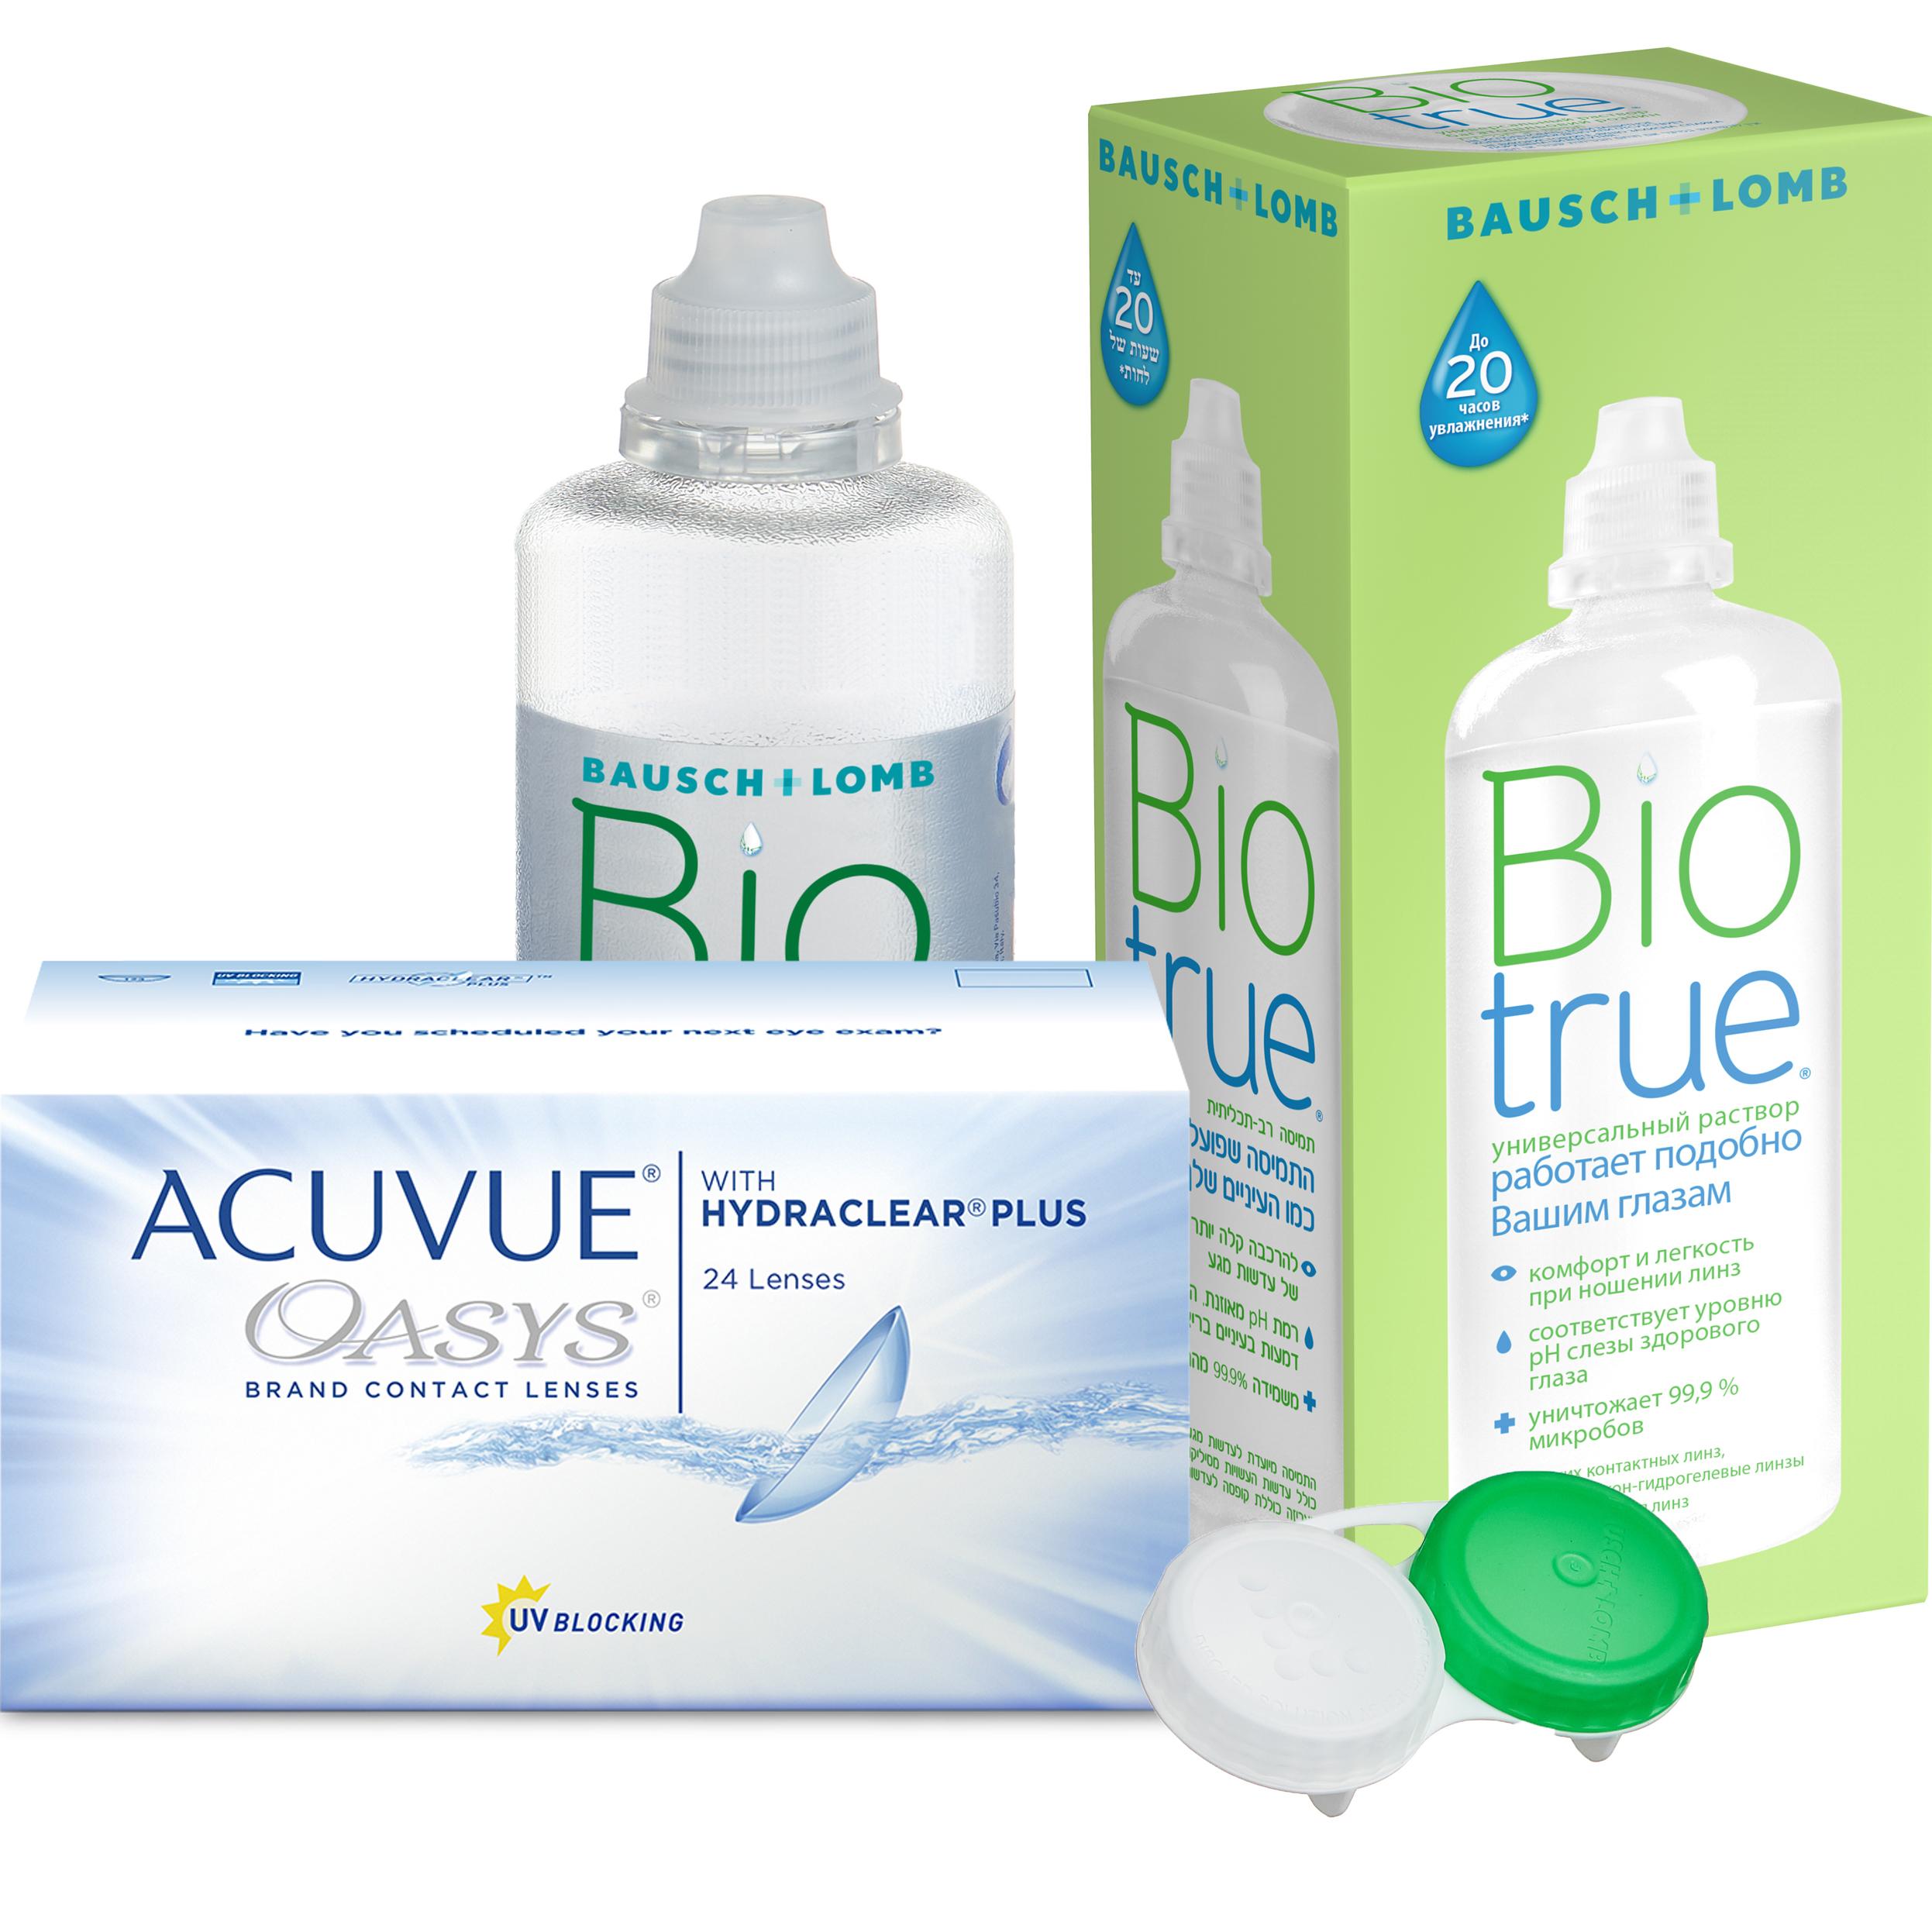 Купить Oasys with Hydraclear Plus 24 линзы + Biotrue, Контактные линзы Acuvue Oasys with Hydraclear Plus 24 линзы R 8.8 -2, 75 + Biotrue 300 мл